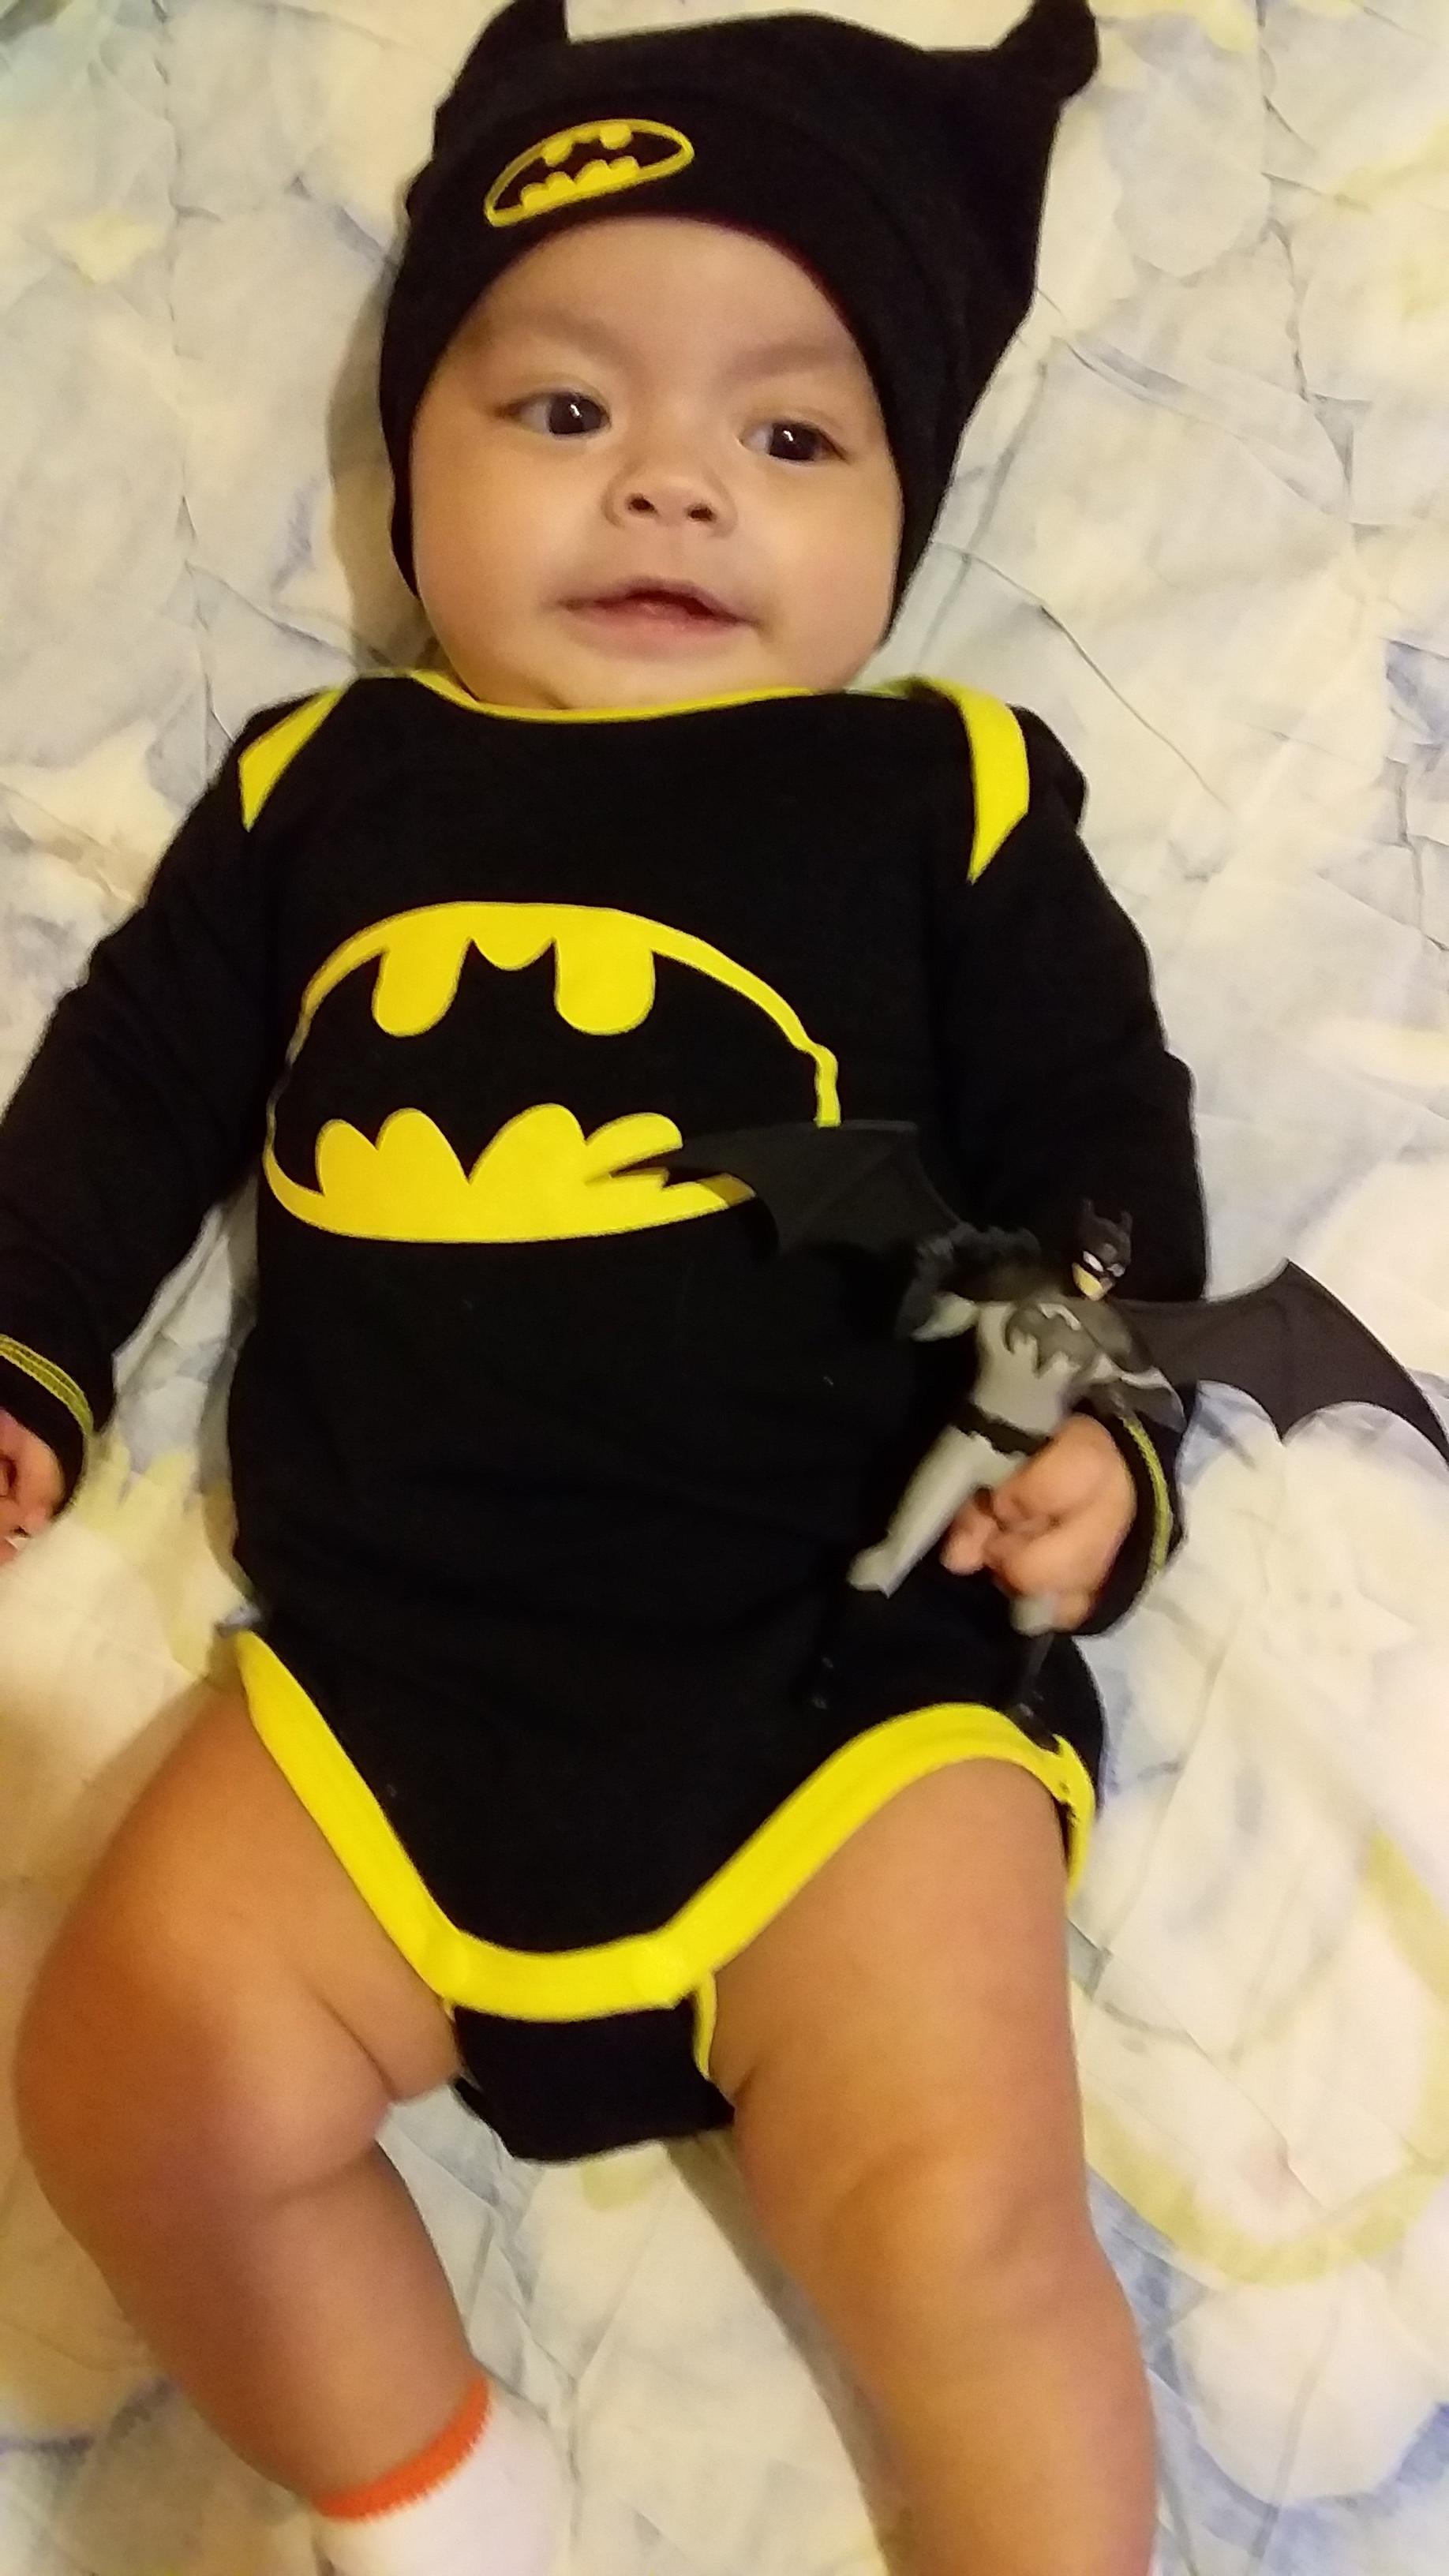 Journey Teller Lamoureux celebrates Batman Day!